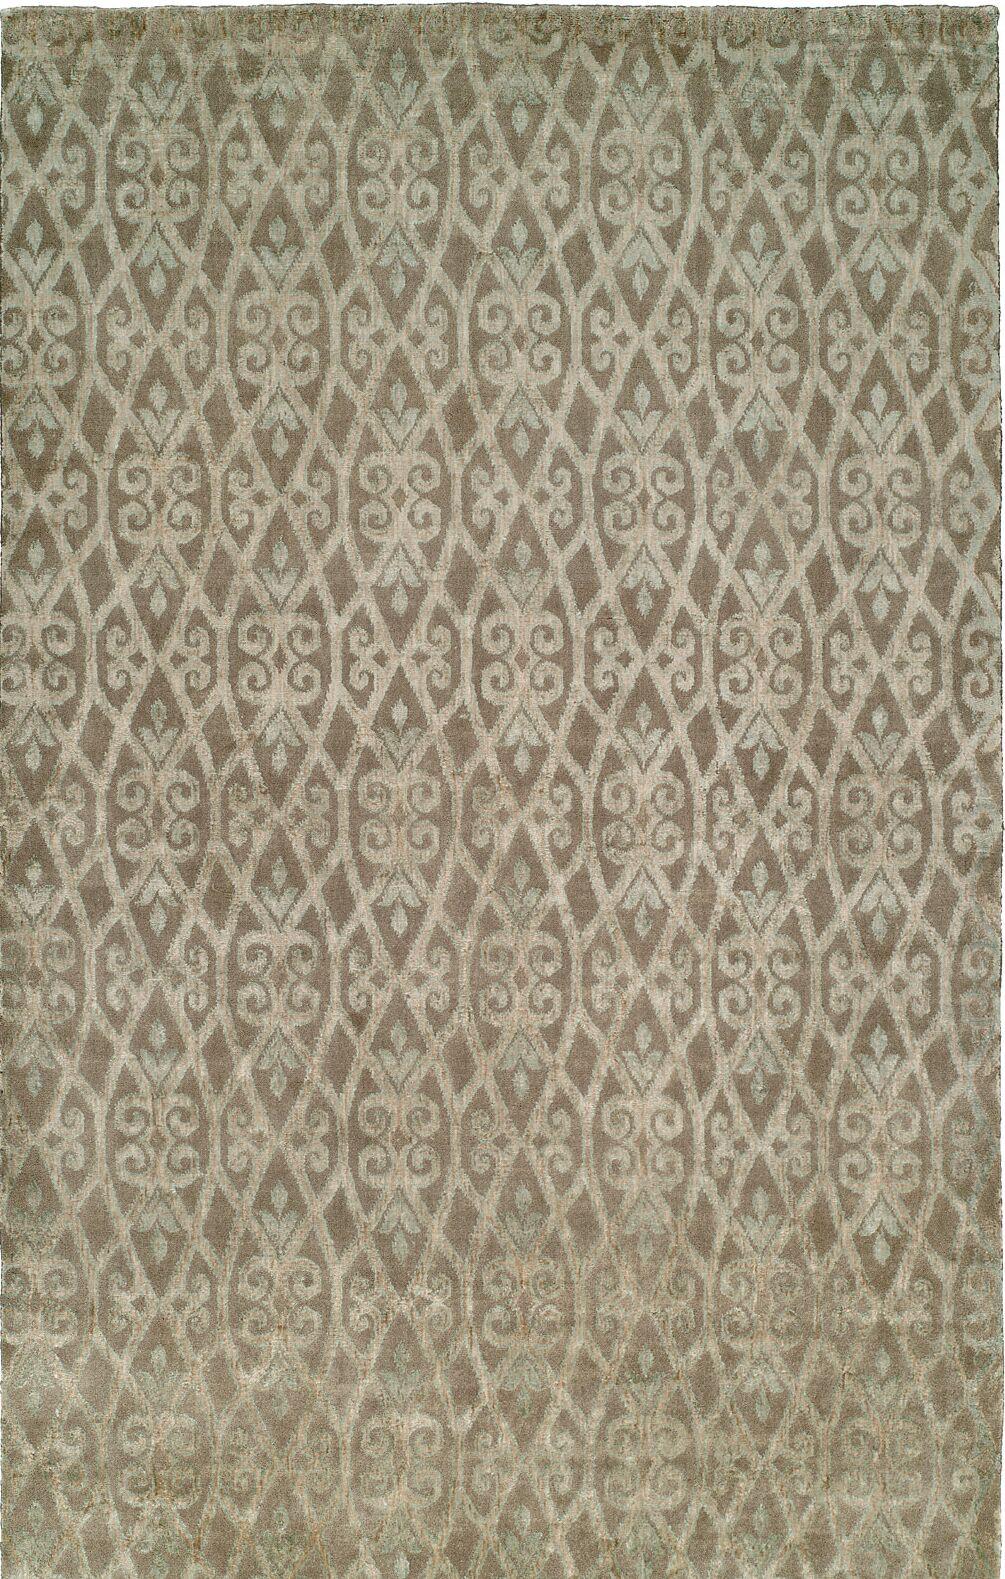 Hand-Woven Beige Area Rug Rug Size: 6' x 9'